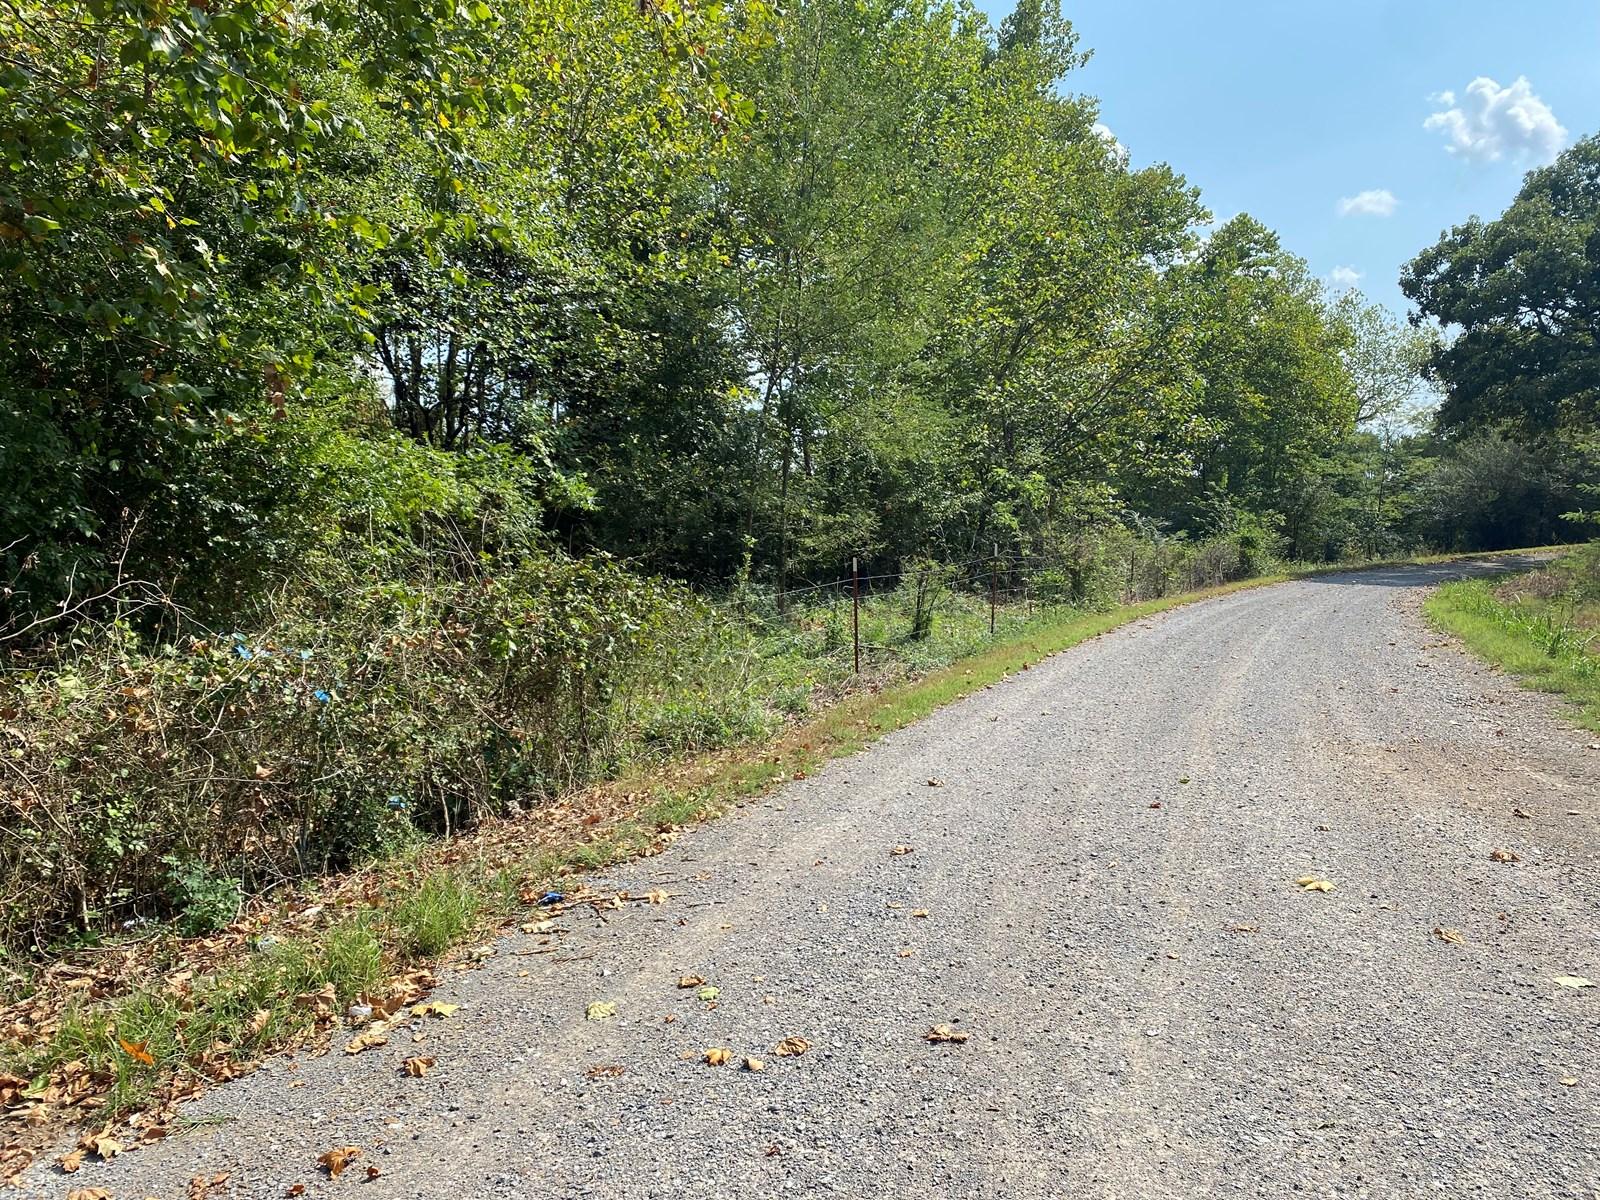 10 Acres for sale Latimer County- Wilburton,OK